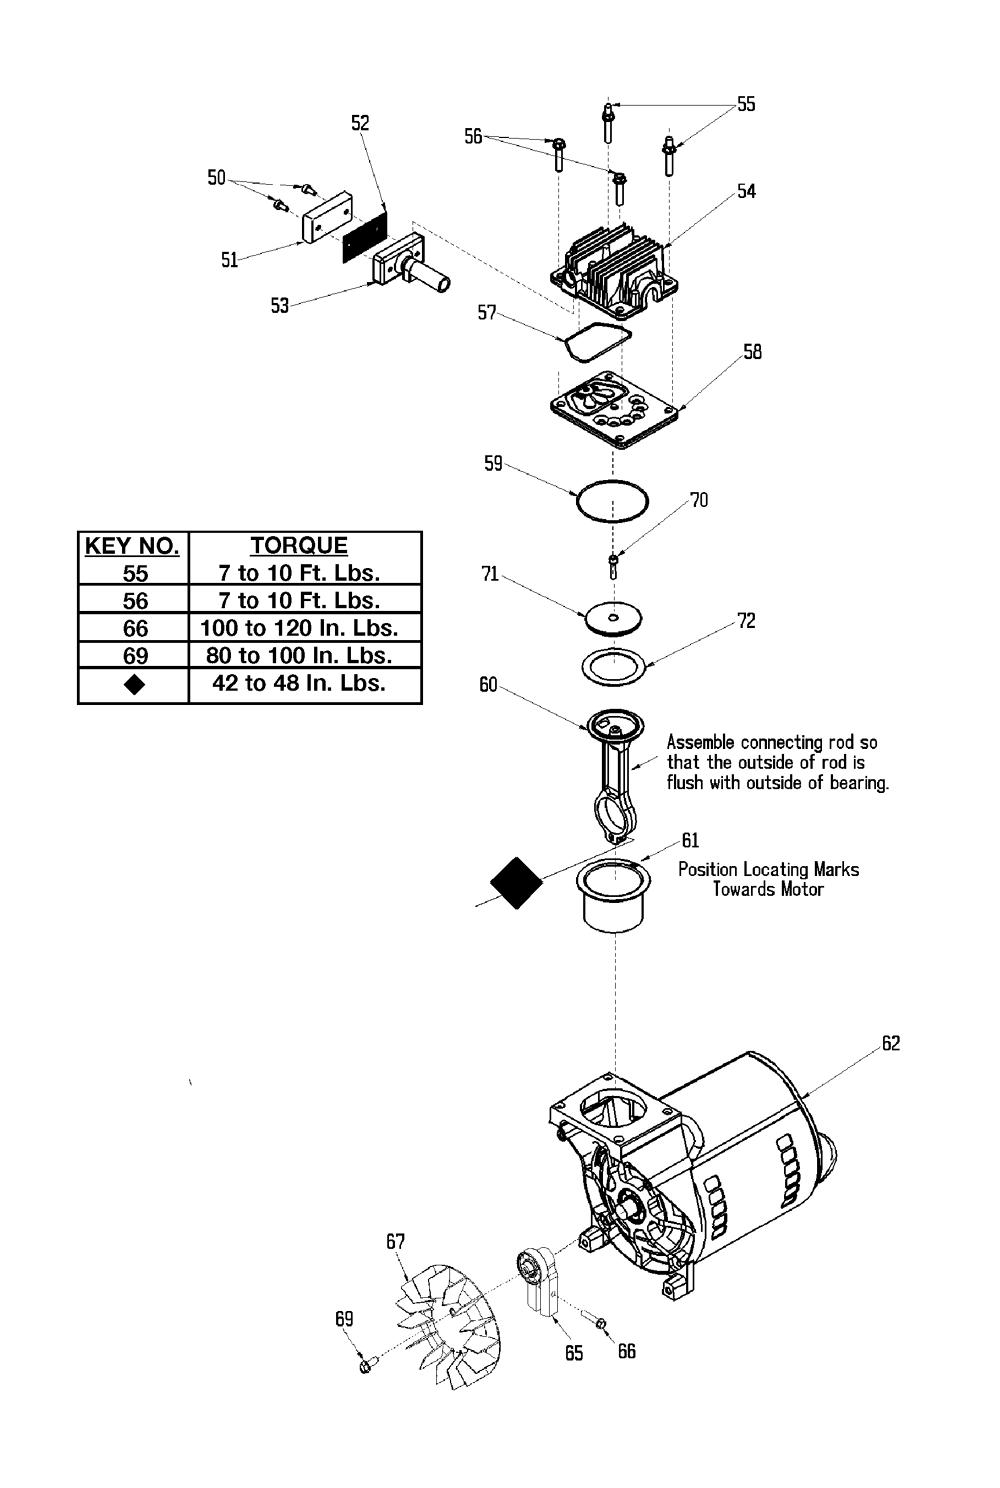 PAF430-Devilbiss-T2-PB-1Break Down